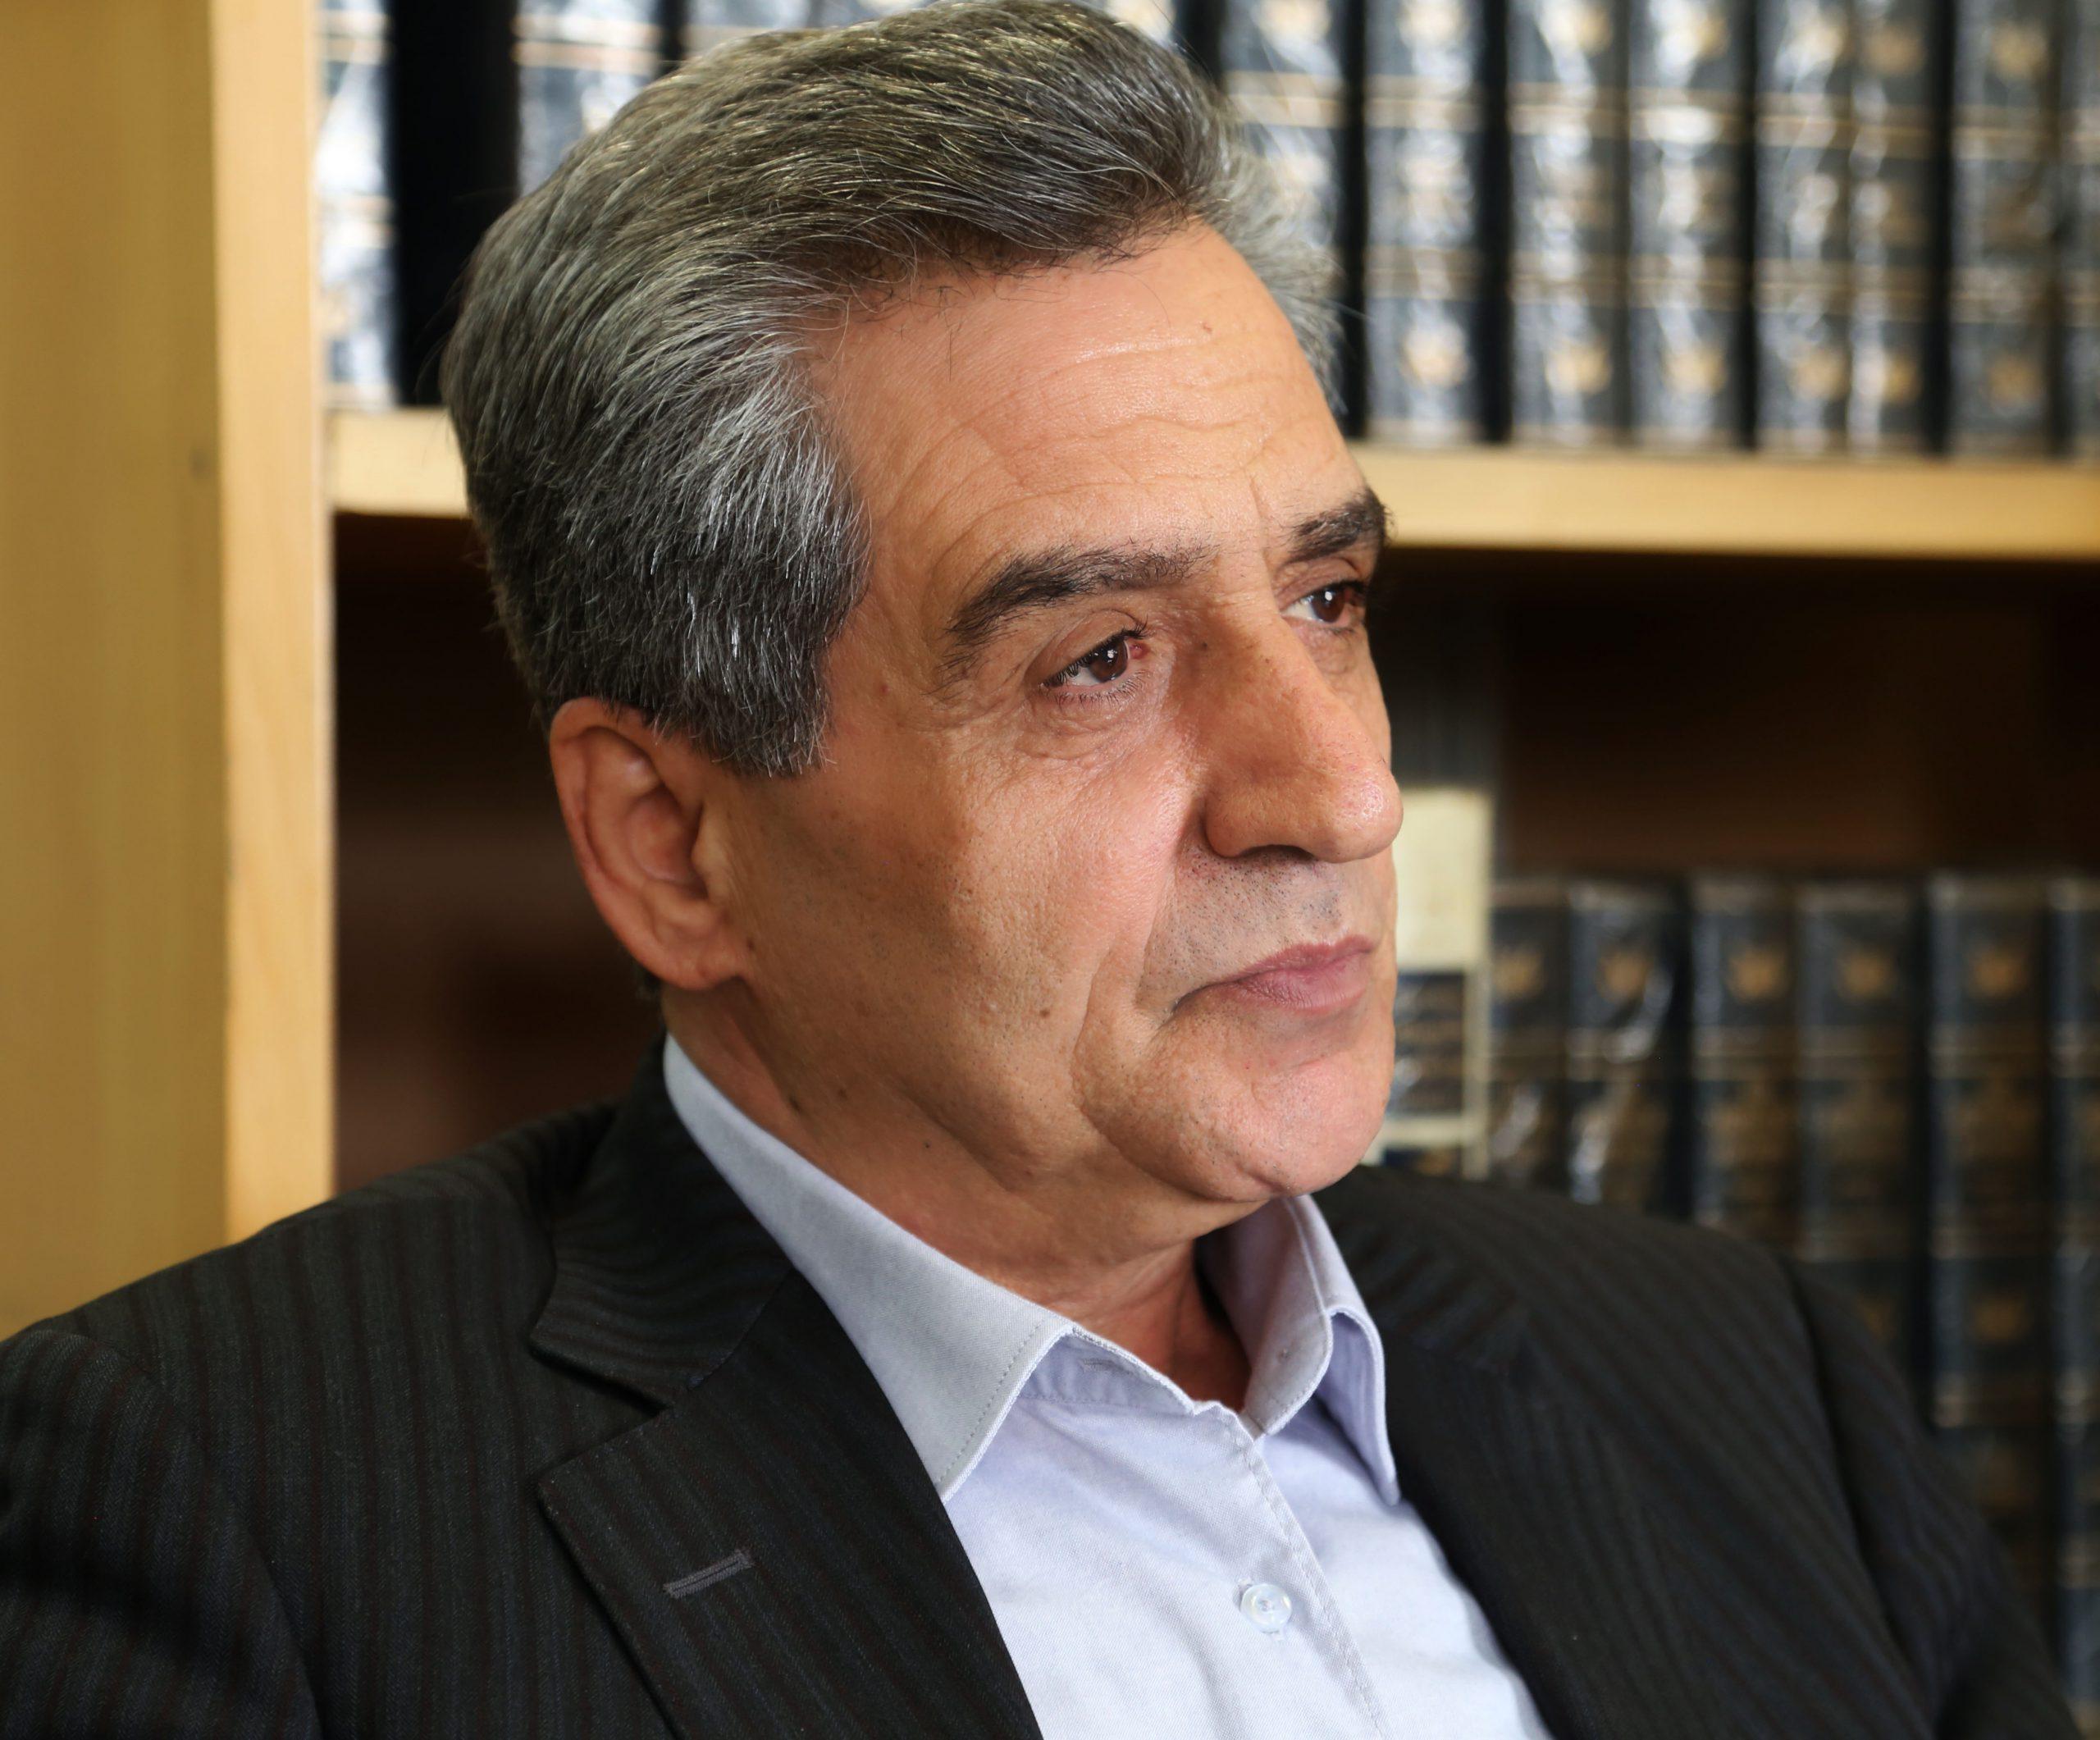 دکتر ابوالقاسم اسماعیل پور